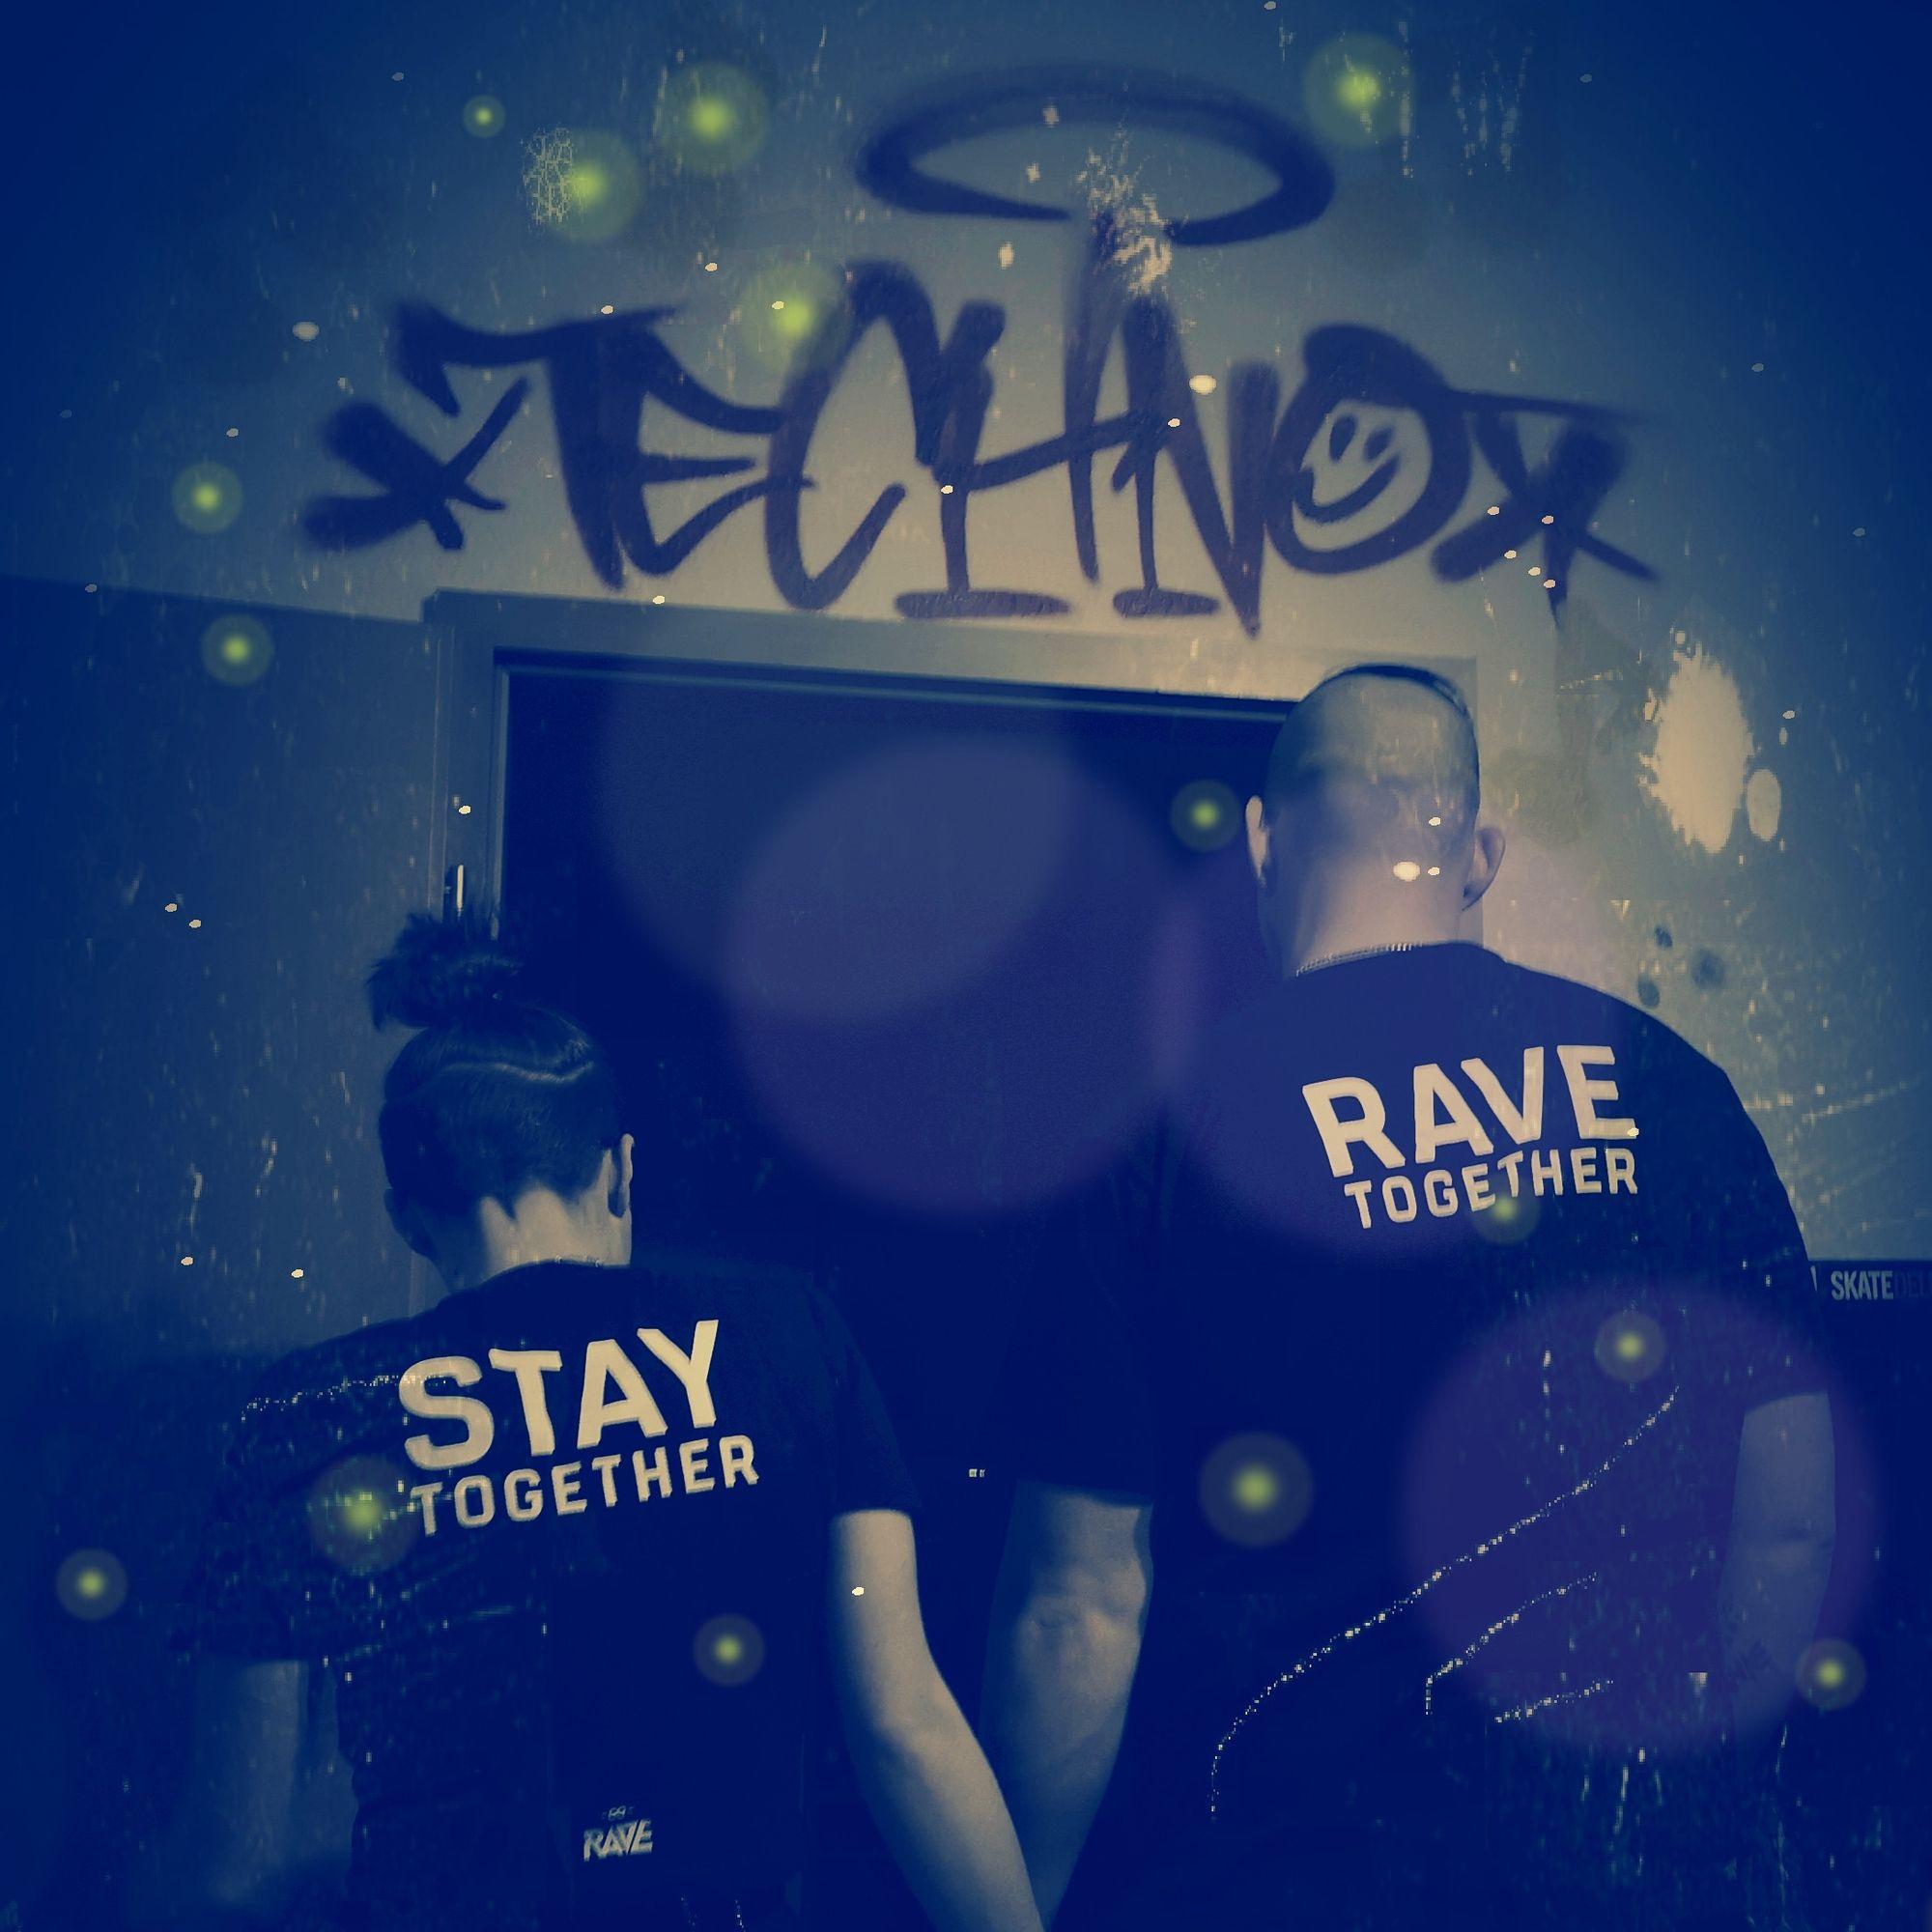 Rave Together - Stay Together 🖤 #ravexclothing   #ravetogetherstaytogether #ravetogether #staytogether #rave #technoclothing #elektronischetanzmusik #raven #technomusic #natureonefestival #technofestival #technofashion #technooutfit #rave #ravegirls #technogirls #afterhour #festivaloutfit #technoliebe #technolove #technokind #ravefashion #technofashion #technodance #technogirls #lovetechno #raveclothing #technogirl #technooutfit #technofamily